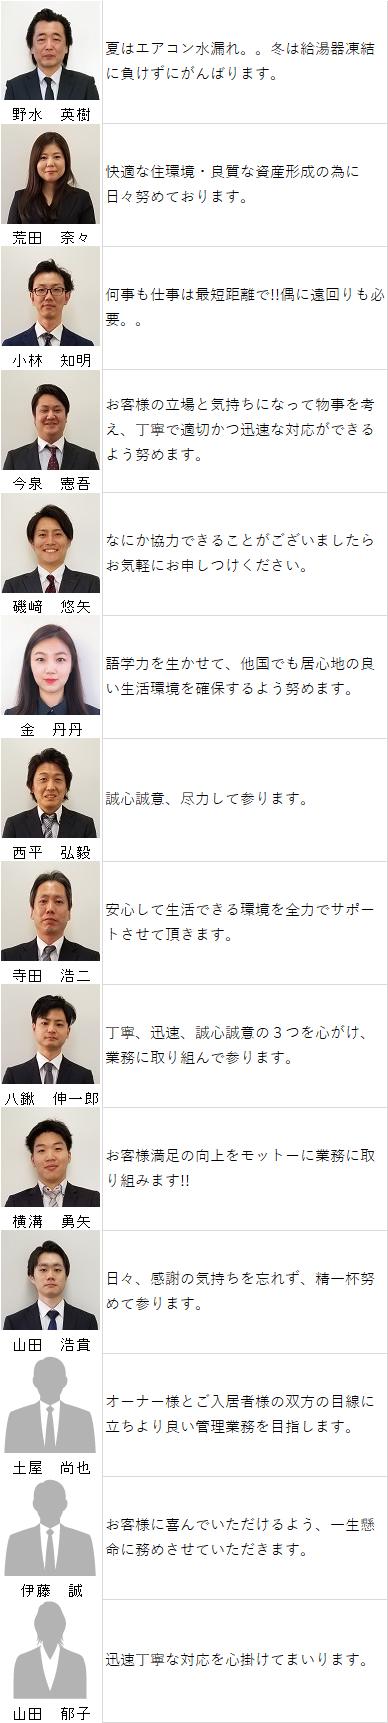 staff chintai